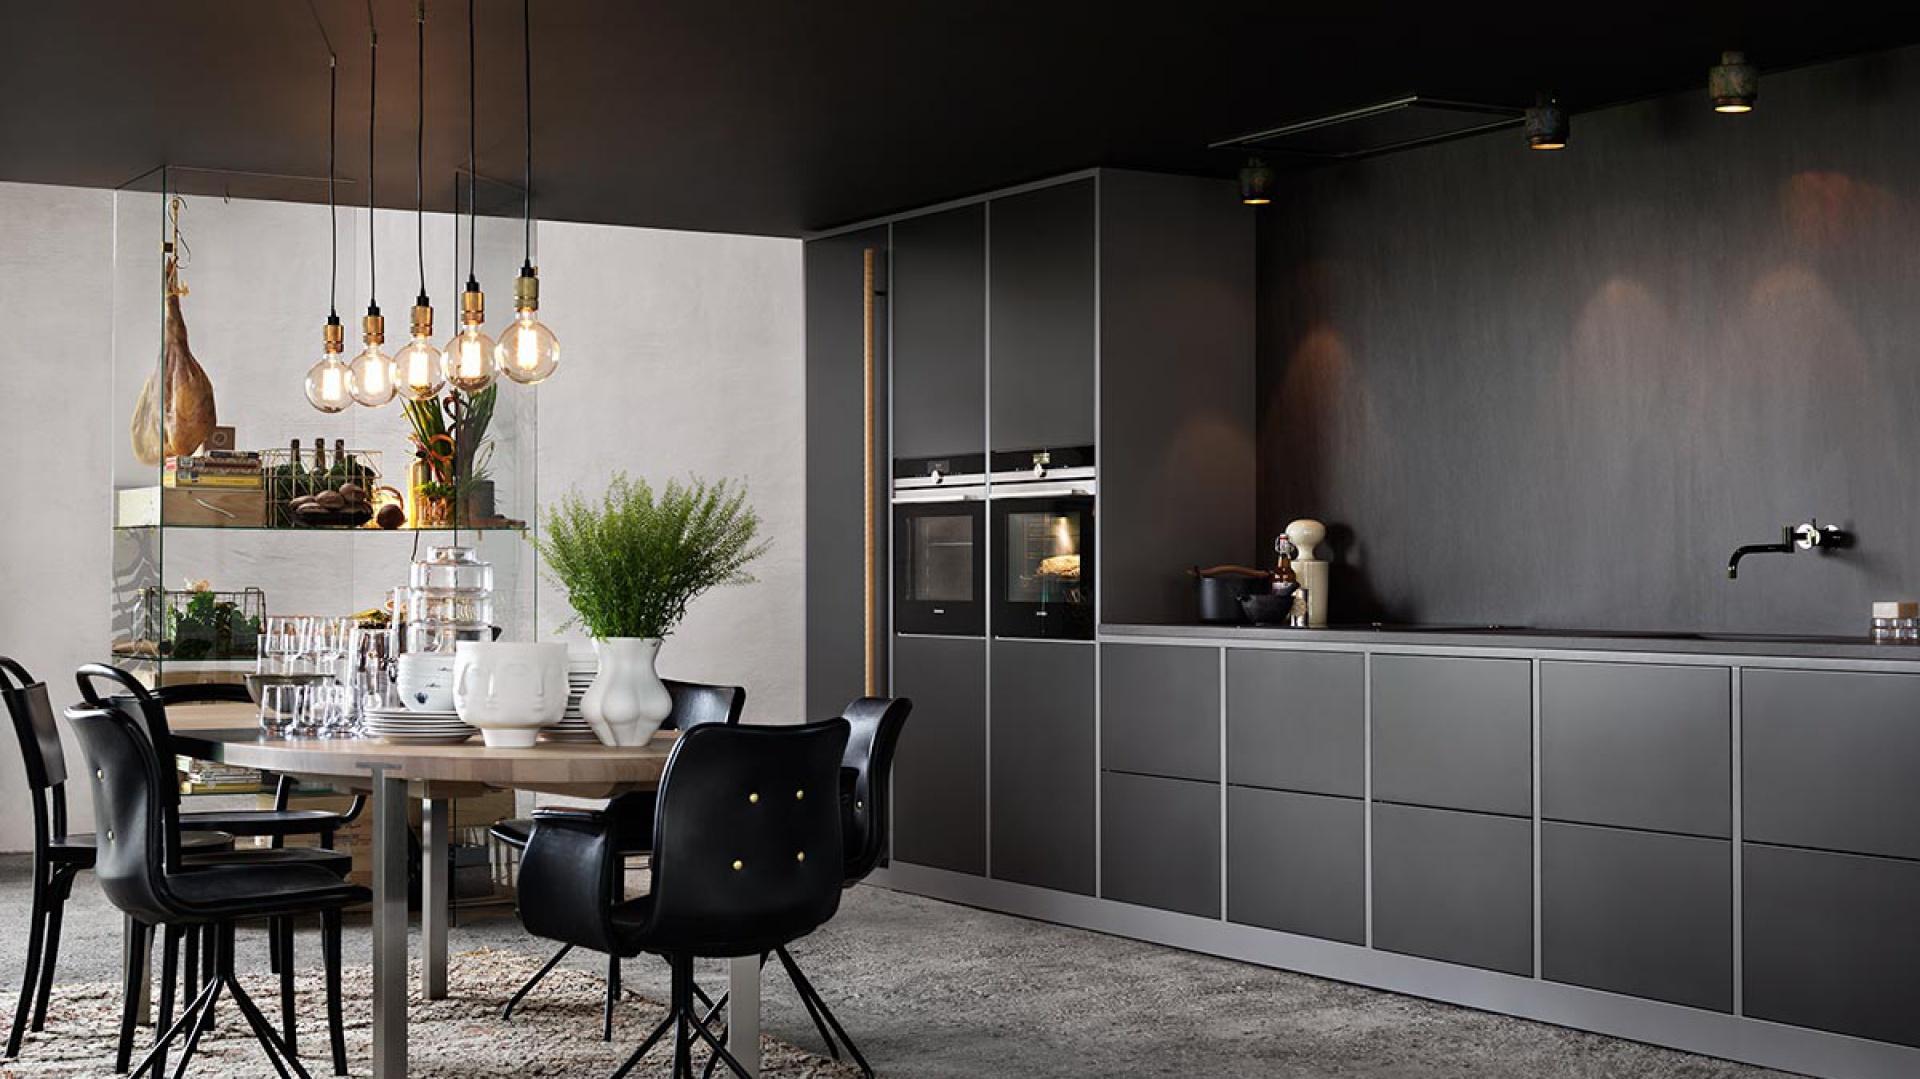 kuchnia w stylu loft tak urz dzisz modne wn trze. Black Bedroom Furniture Sets. Home Design Ideas